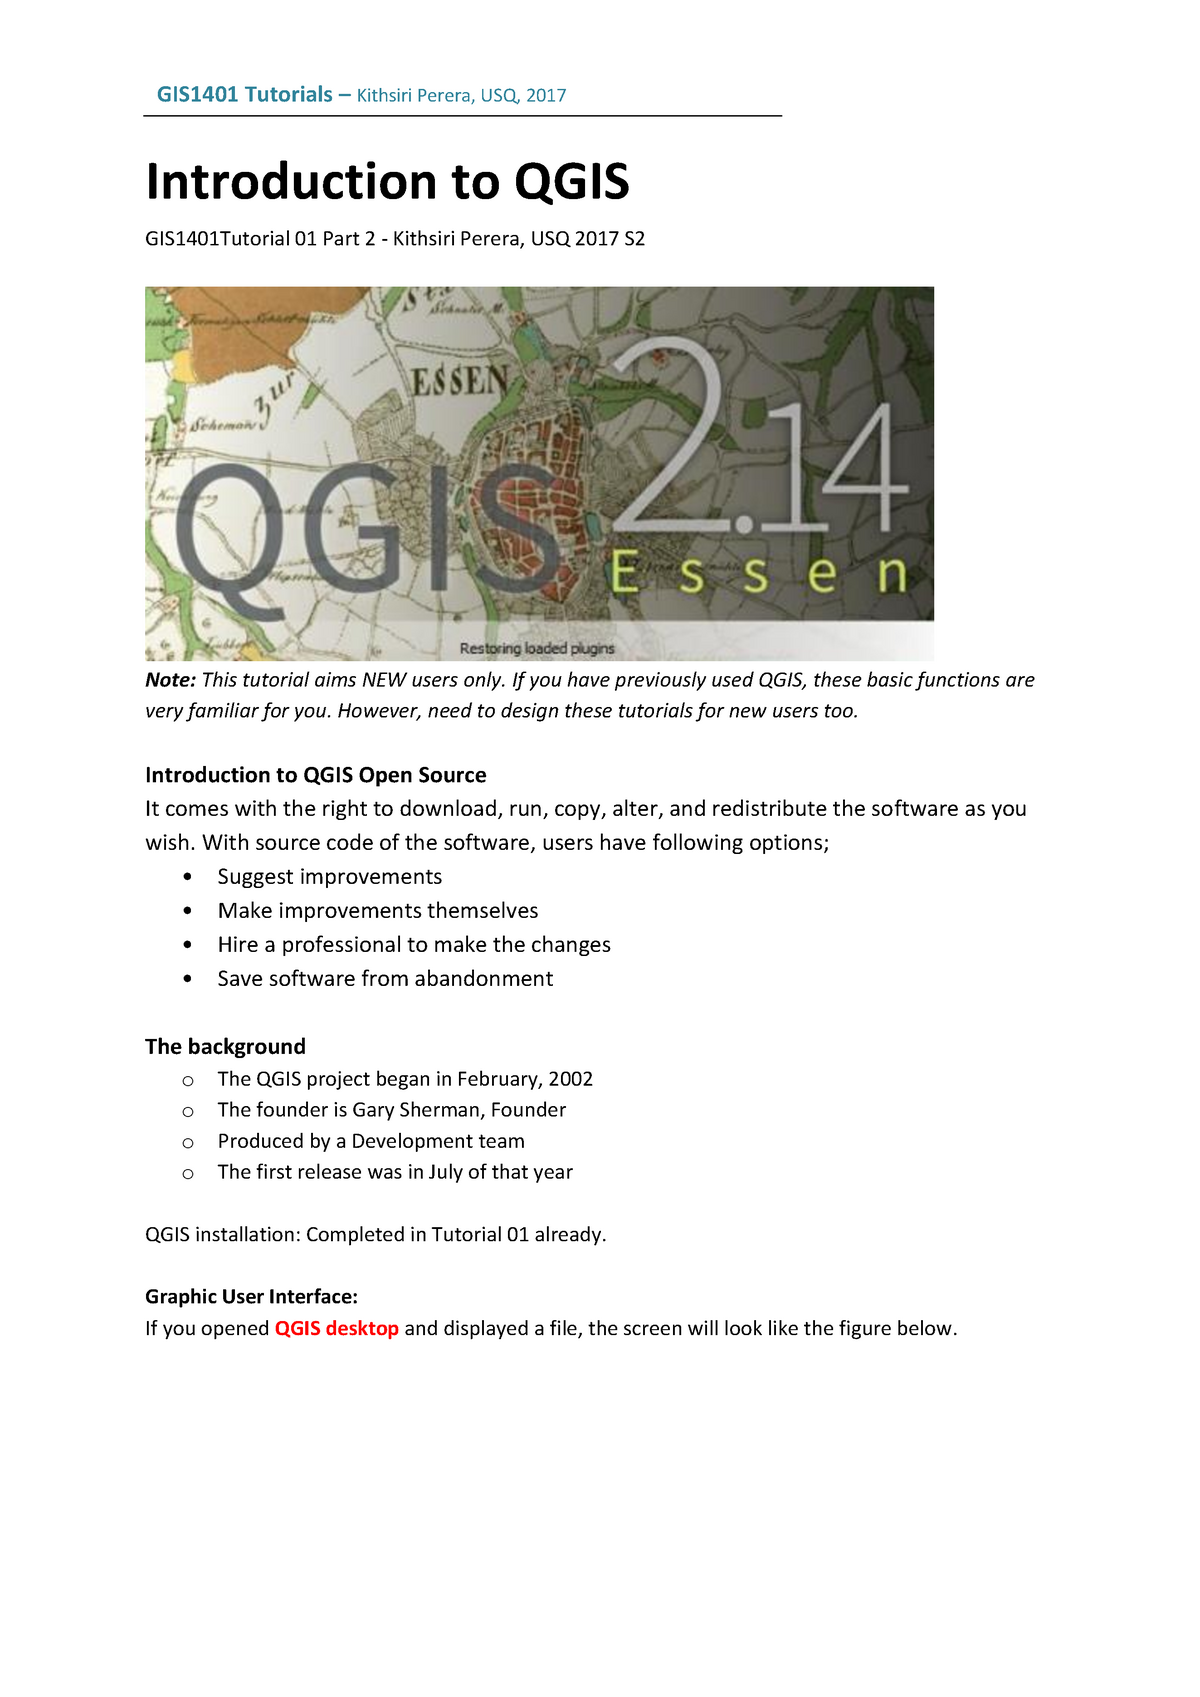 2017 QGIS TU01 QGIS part 02 - GIS1401 - USQ - StuDocu